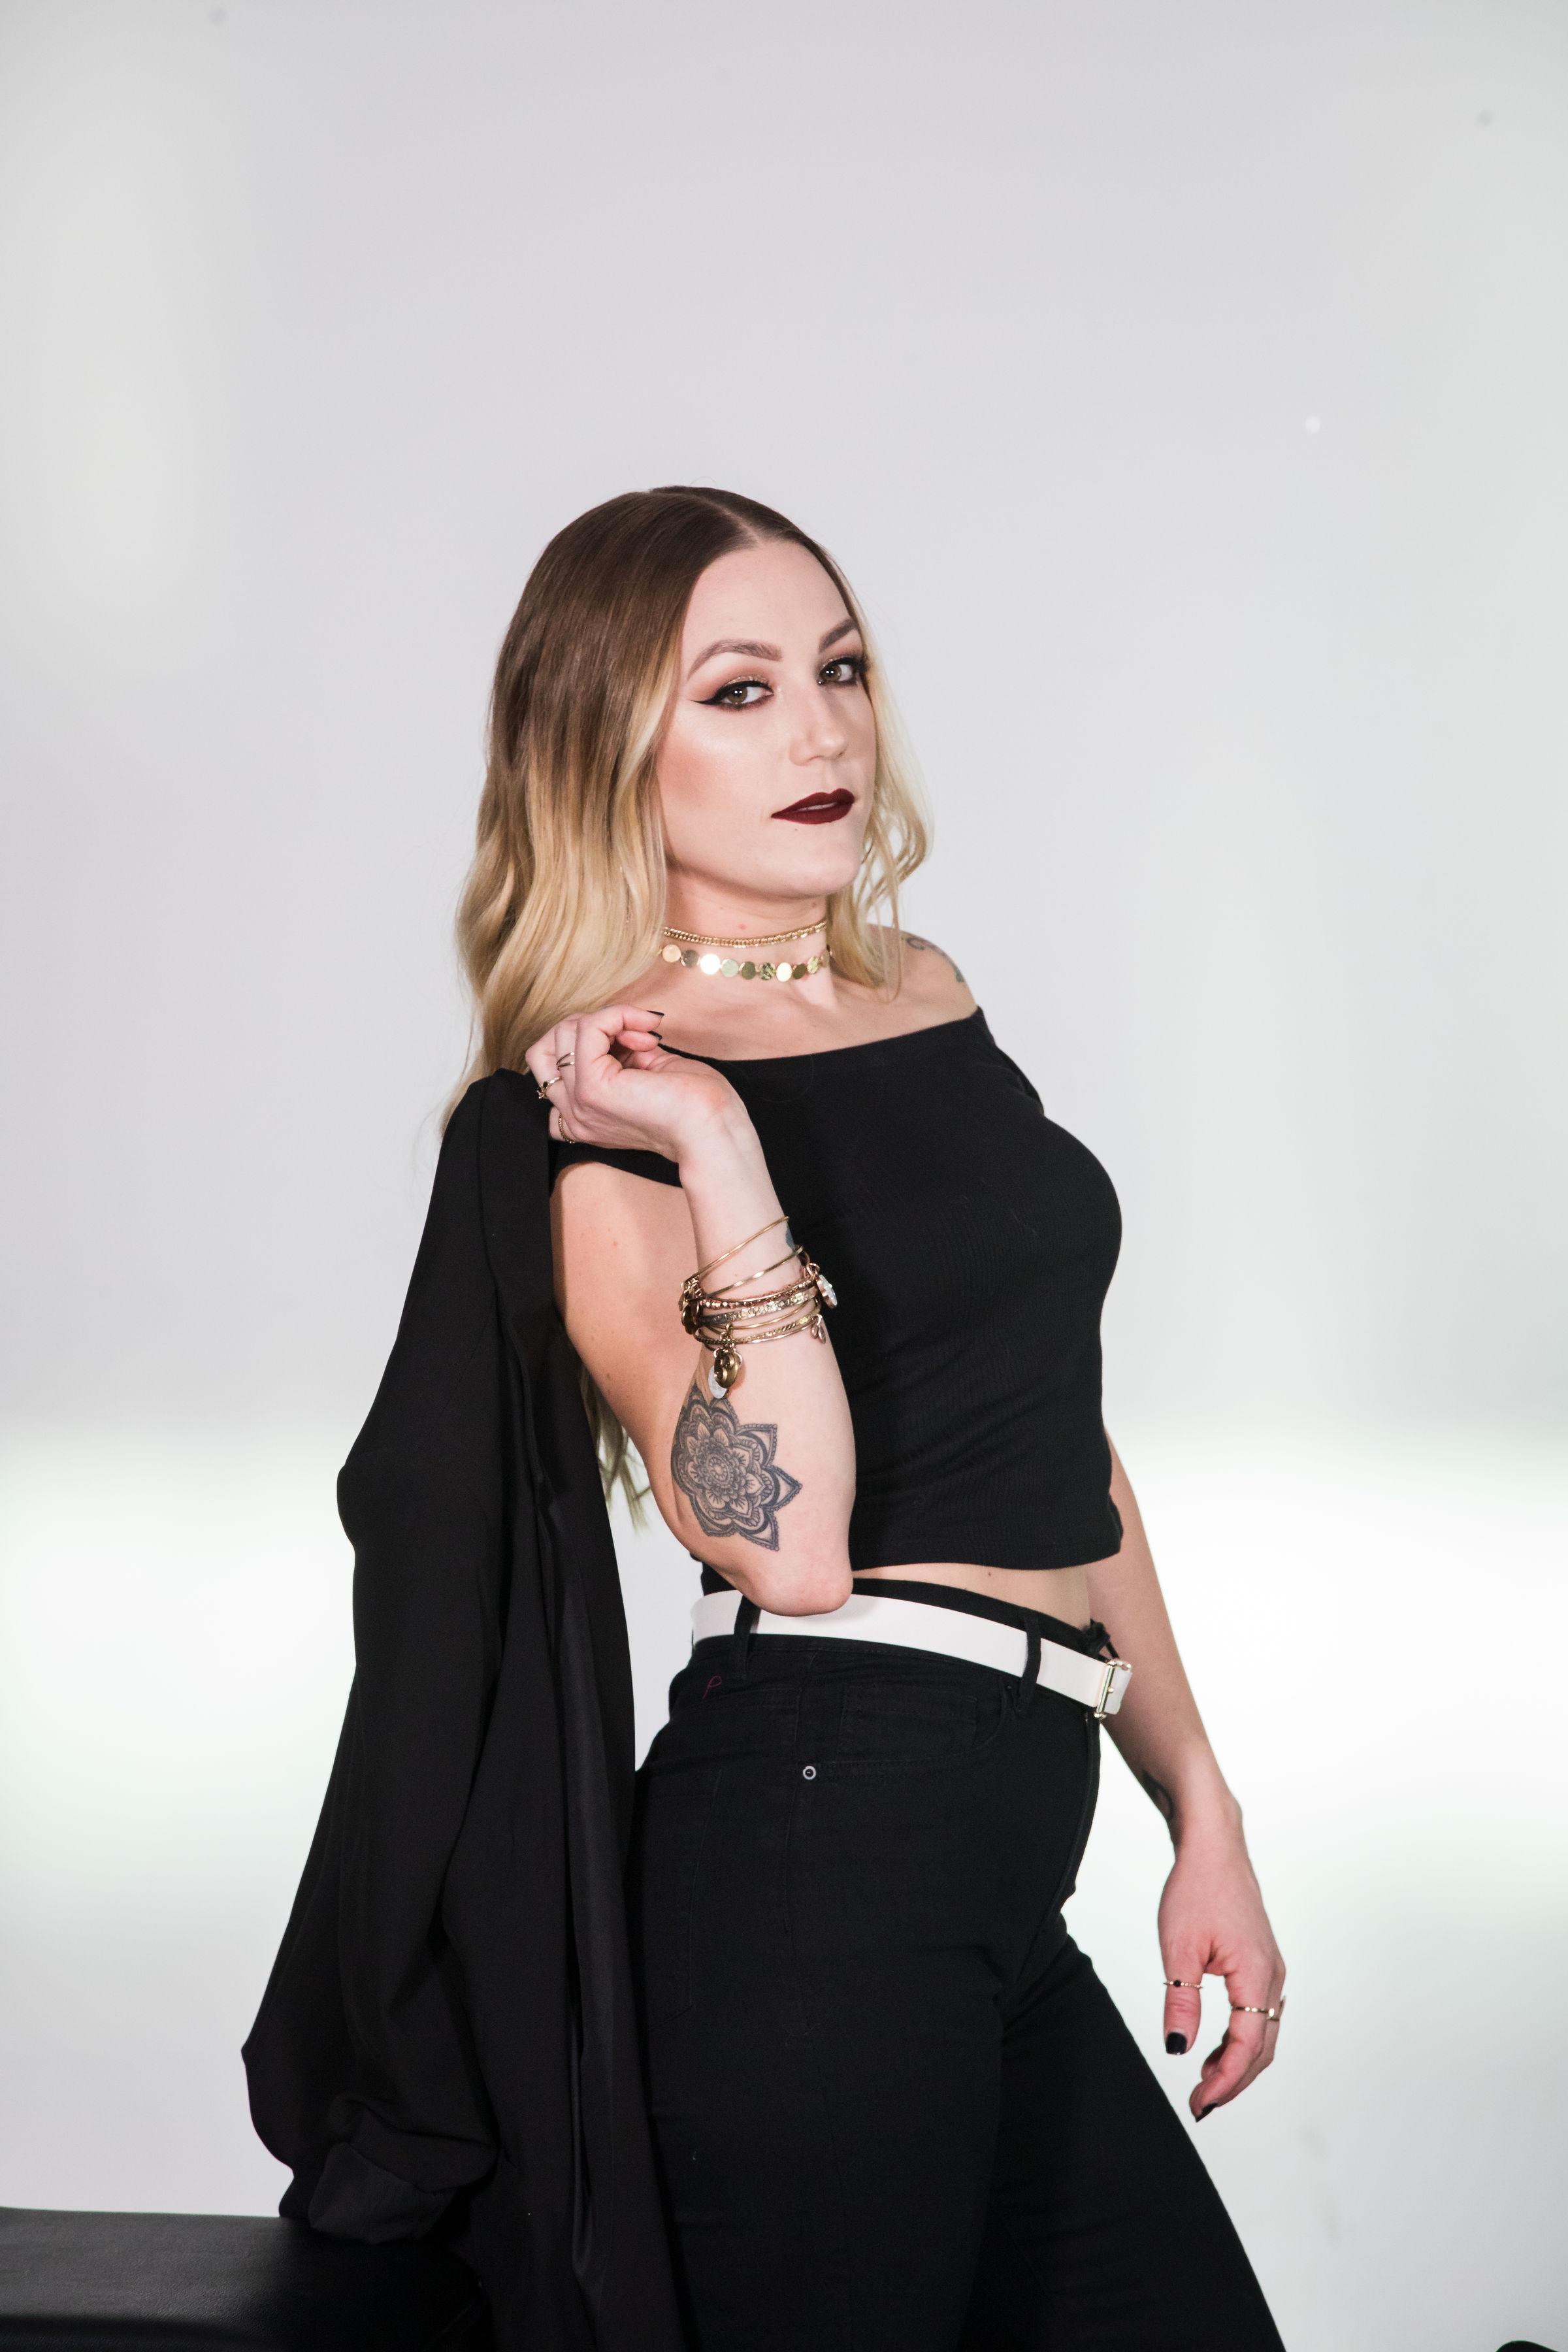 Alicia W Special Effects Makeup Artist Las Vegas